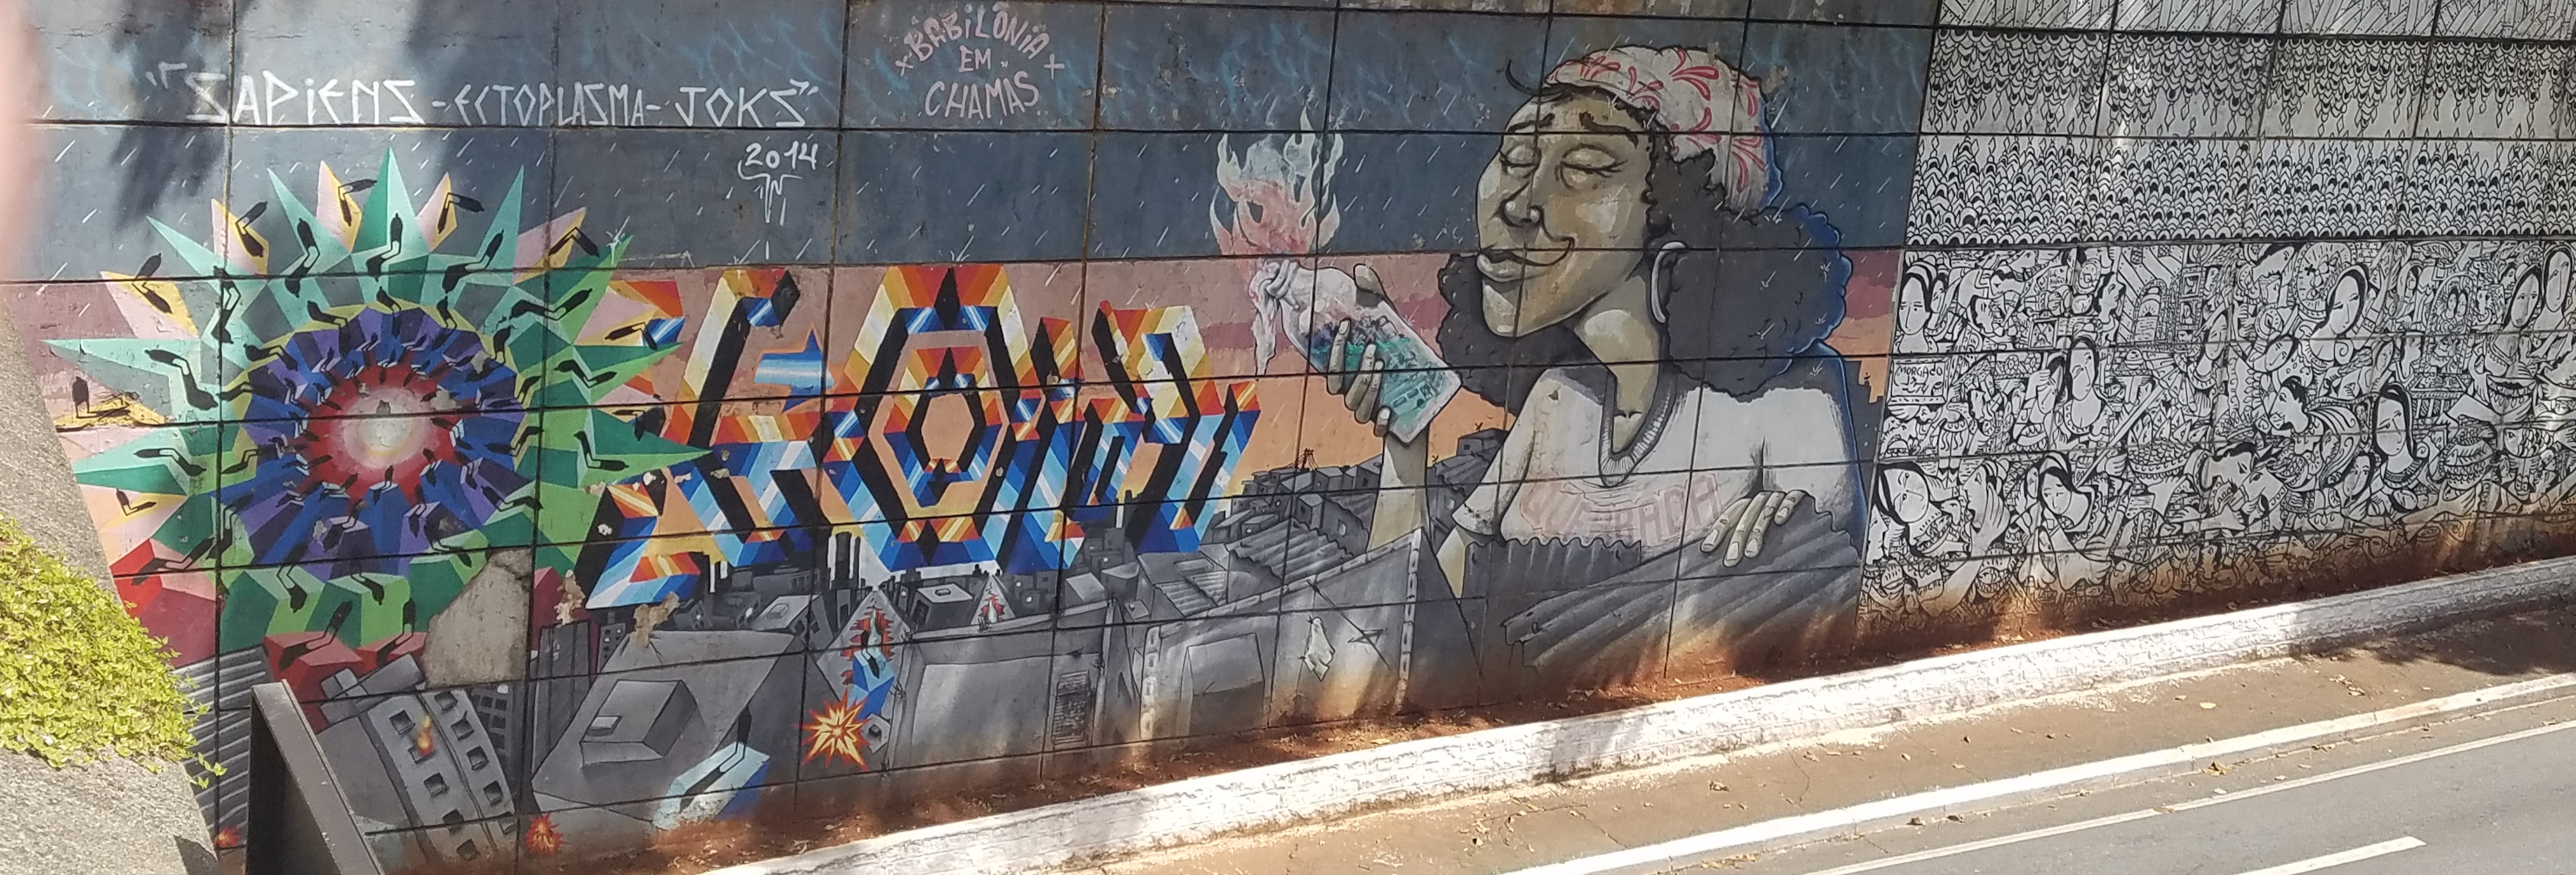 20190319_193826-jpg.49896_Public murals/street art/other images from São Paulo, Brazil_Art & Music_Squat the Planet_11:34 AM